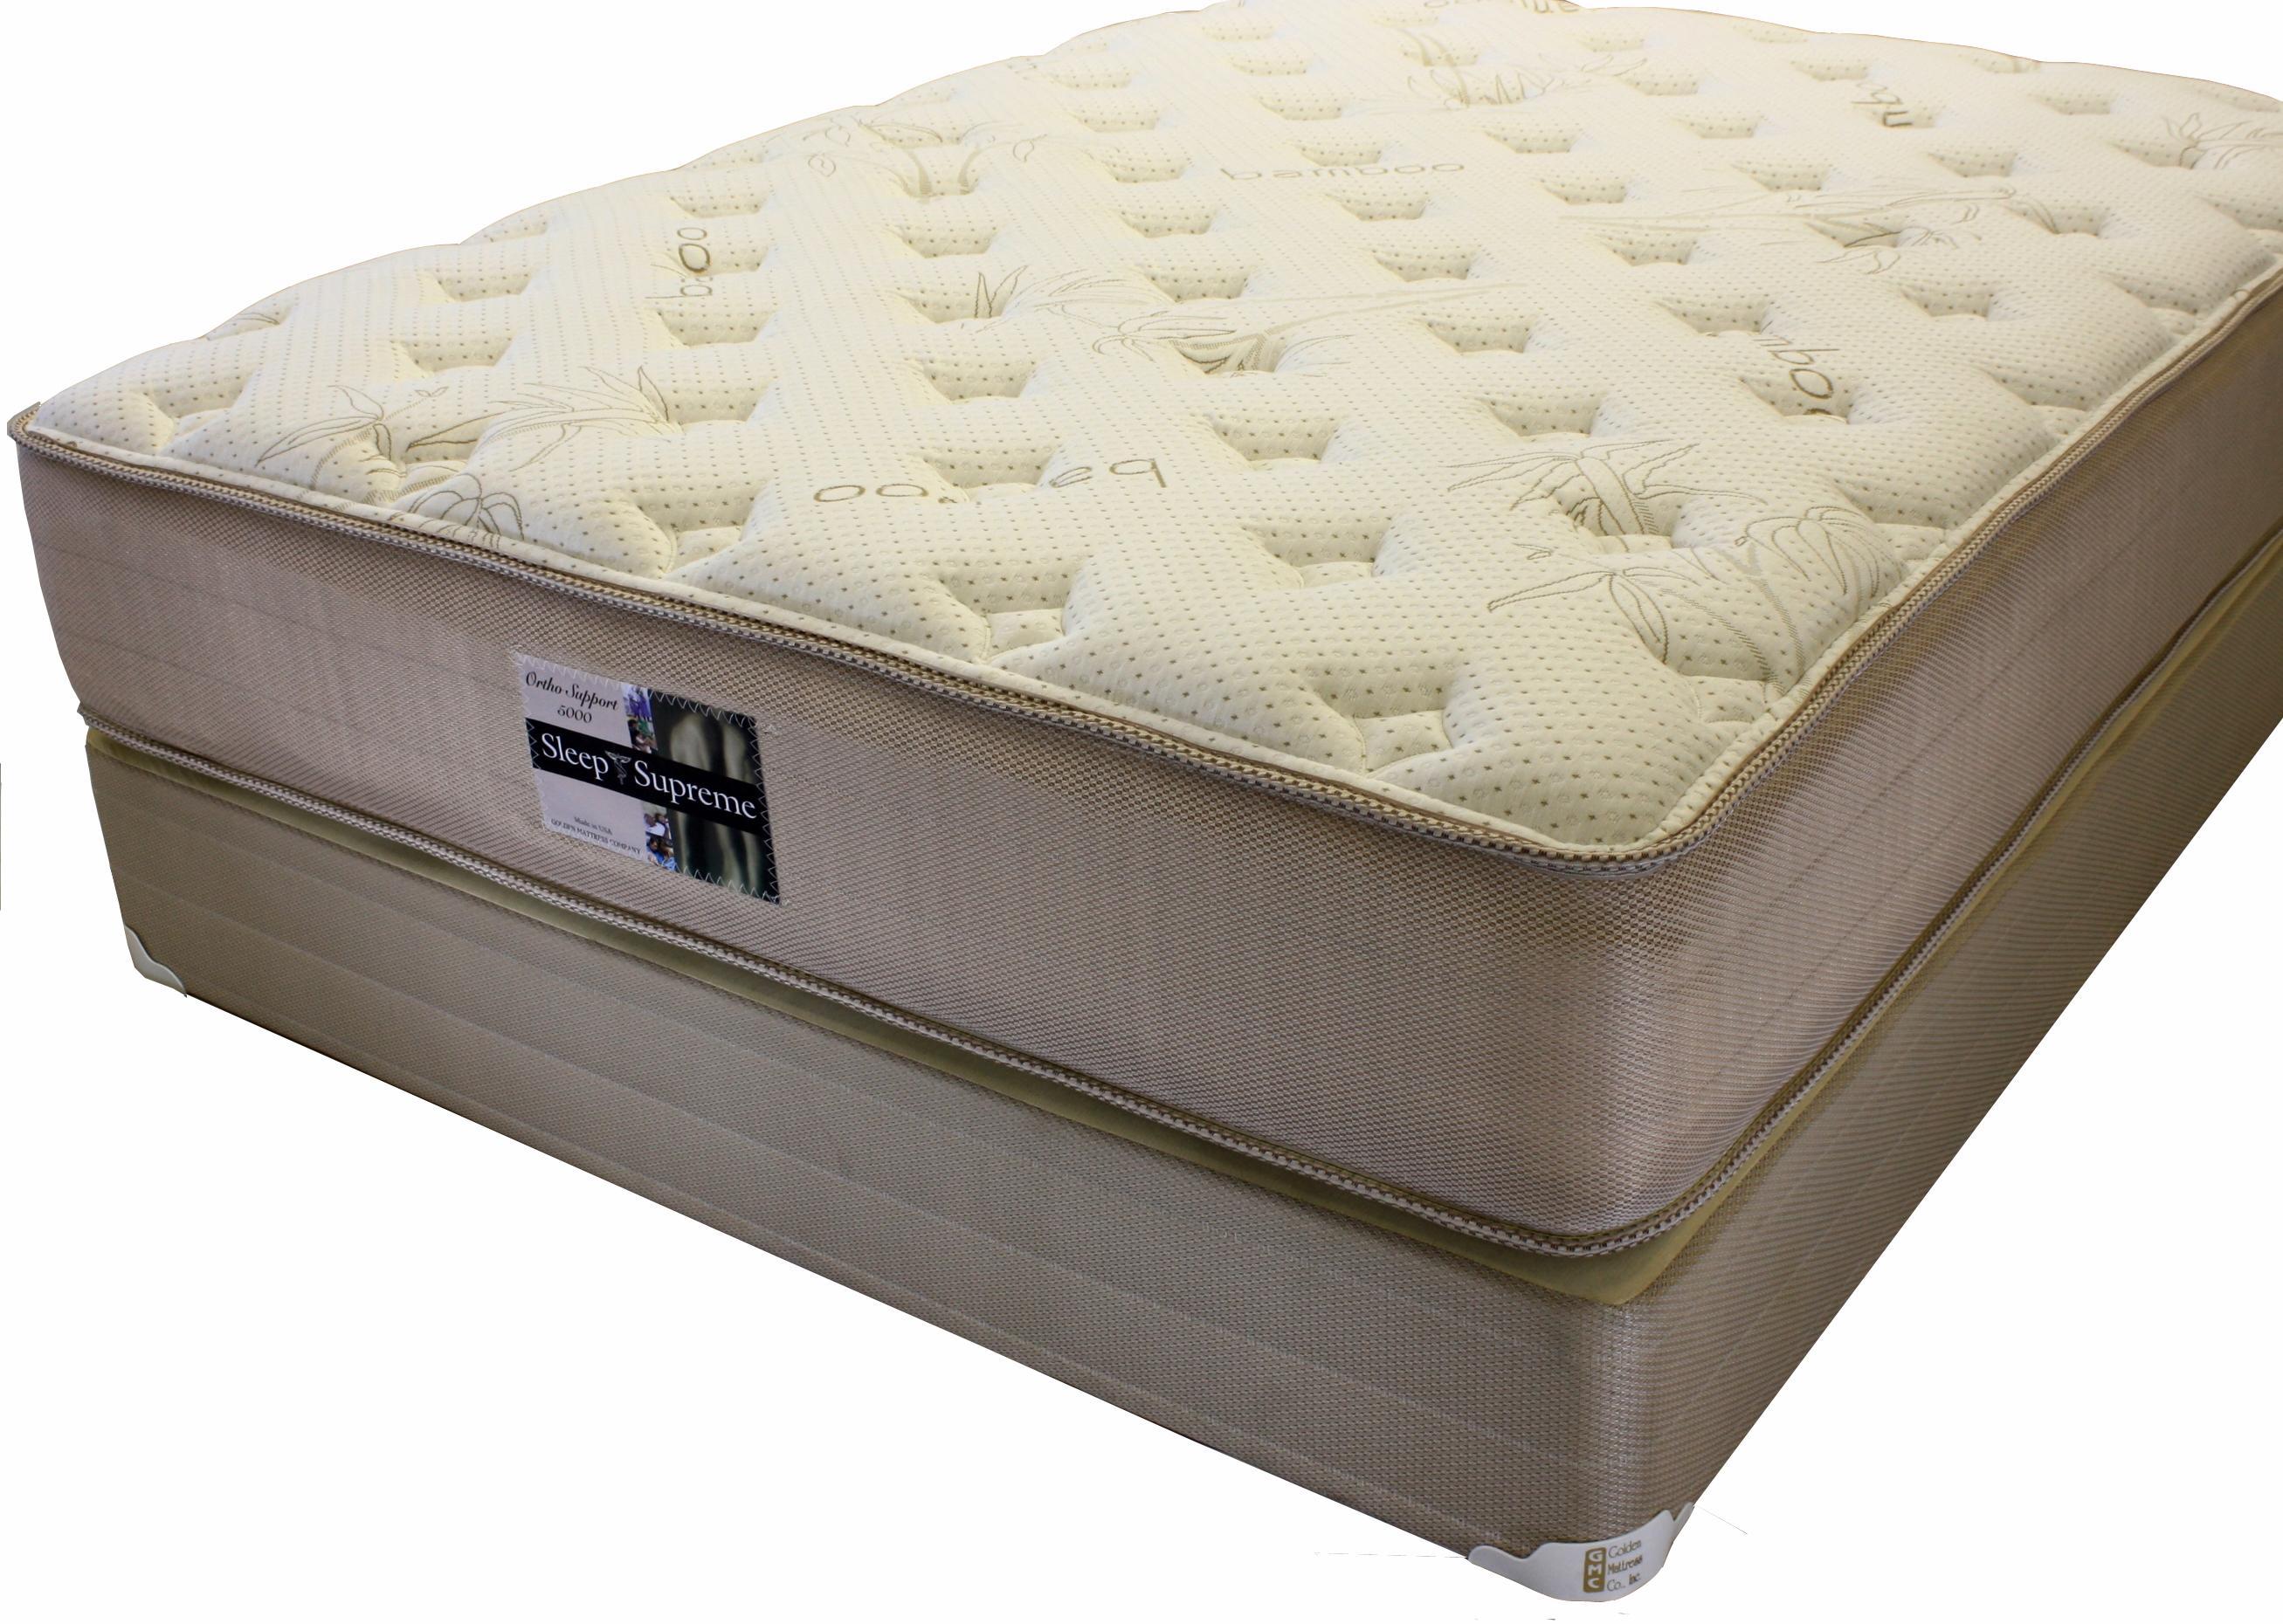 pad foam bodyform slumber inch orthopedic topper and solutions memory fiber mattress